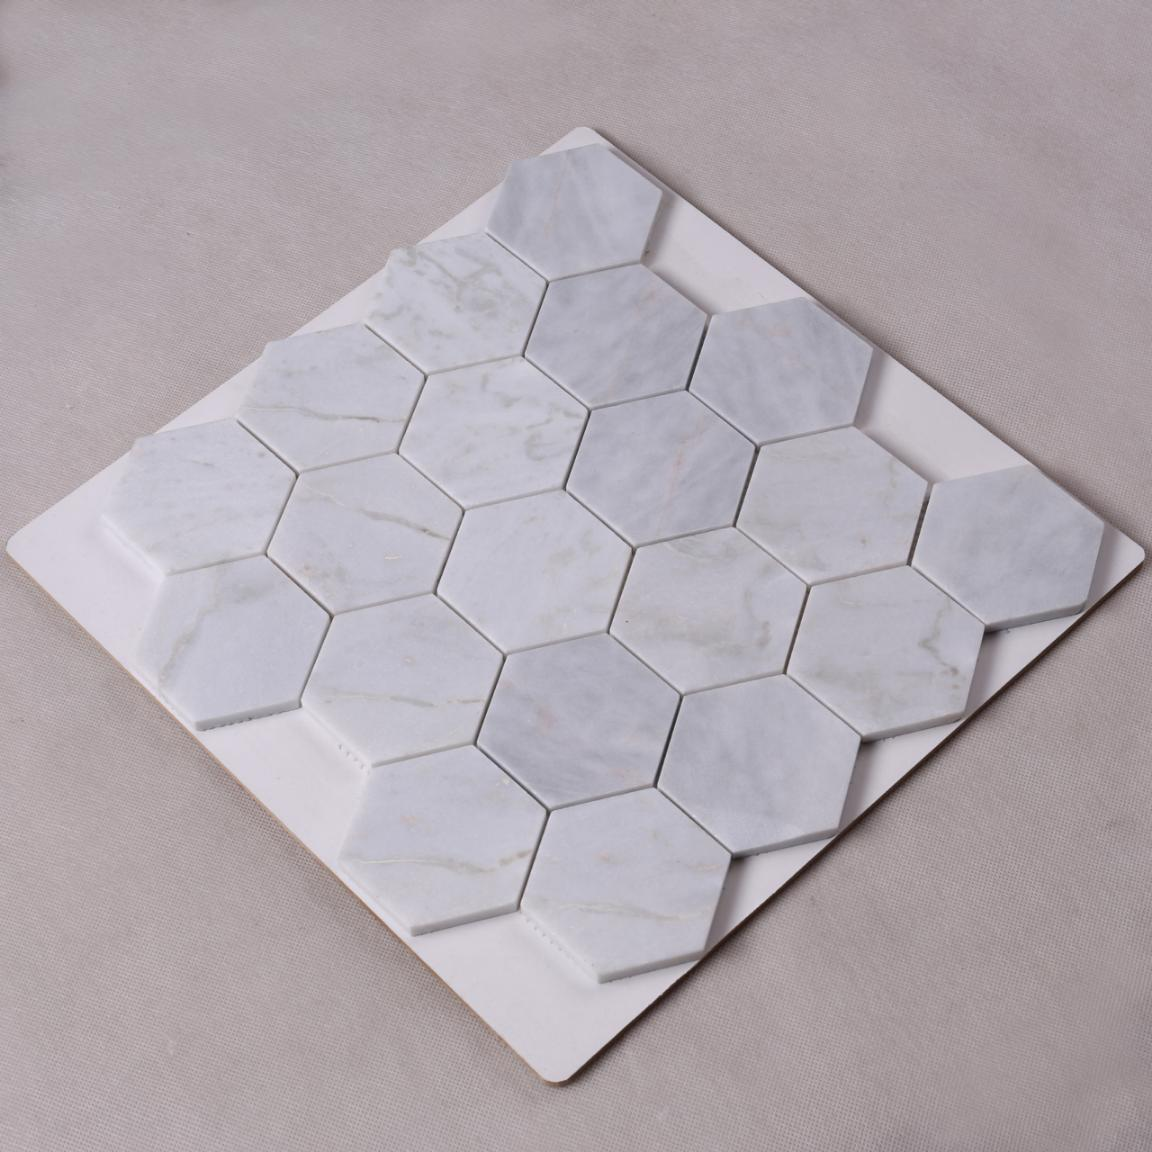 product-Heng Xing-Stone Mosaic Tile Mosaic Tile-img